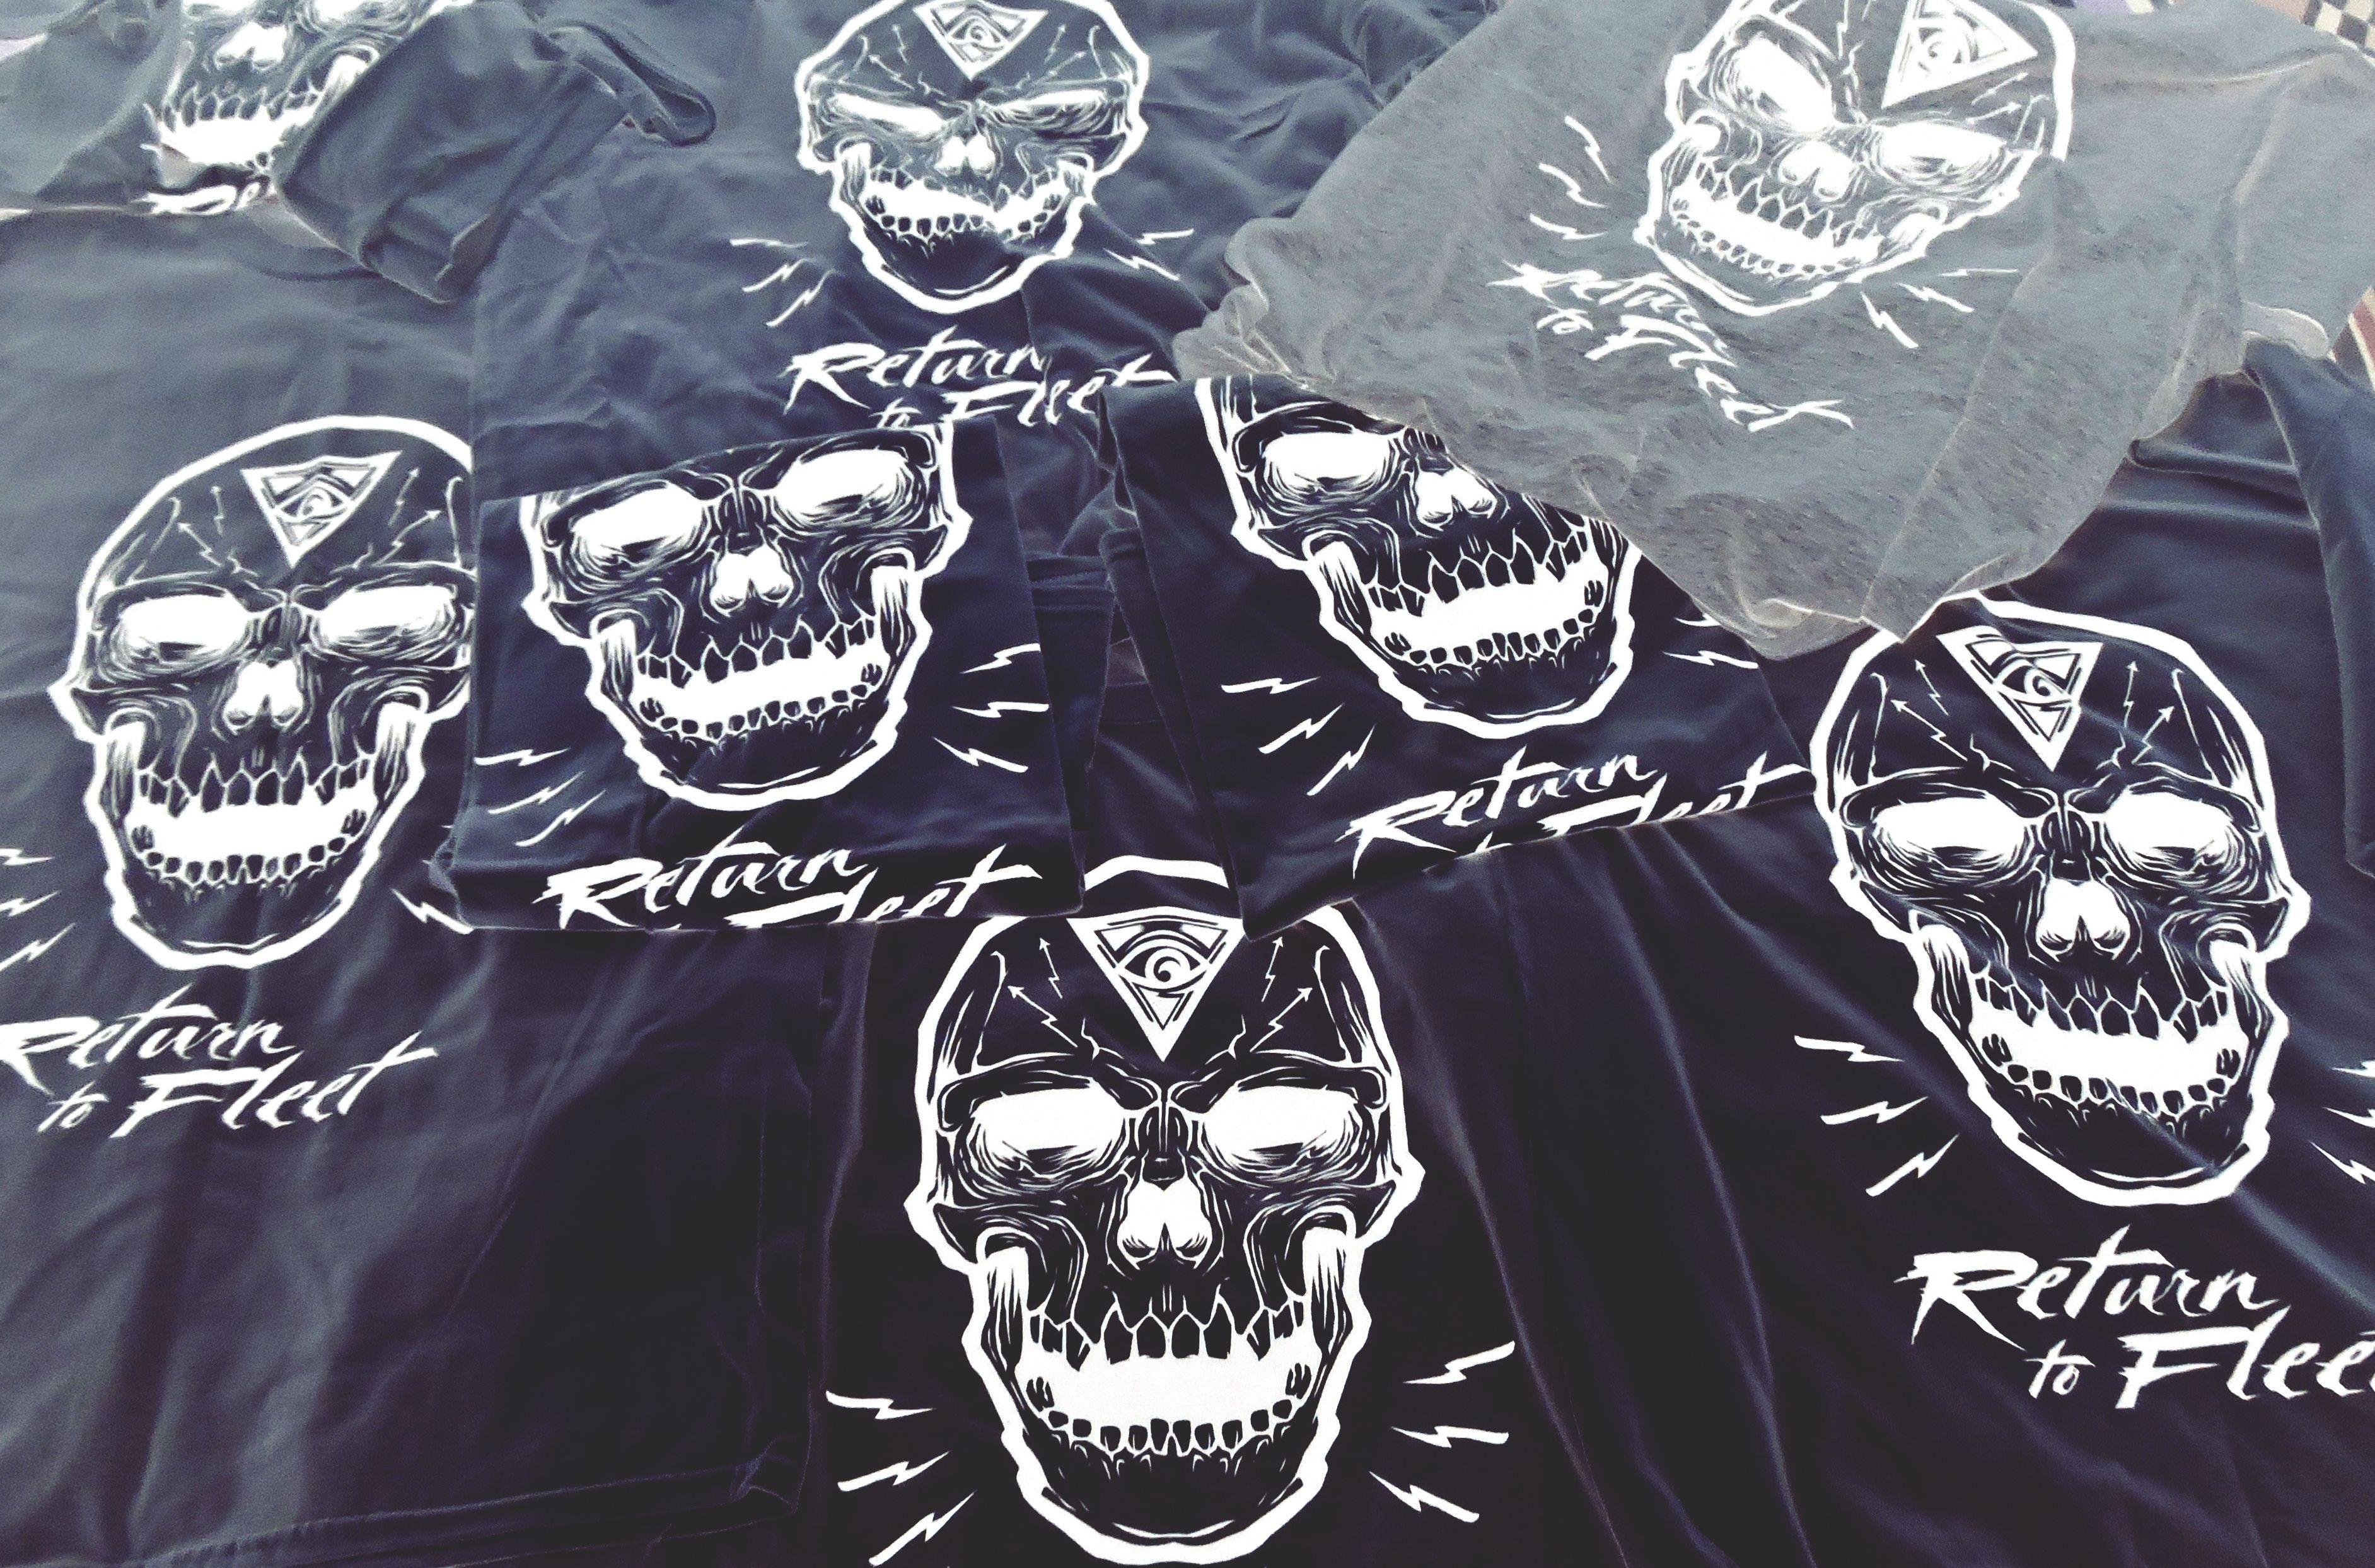 HydroSkull Tees #ReturntoFleet #Invasion #Skulduggery #Brand #Geek #ScreenPrint #Studio #Blog #GeekArt #Tshirts #Products #Website #Life